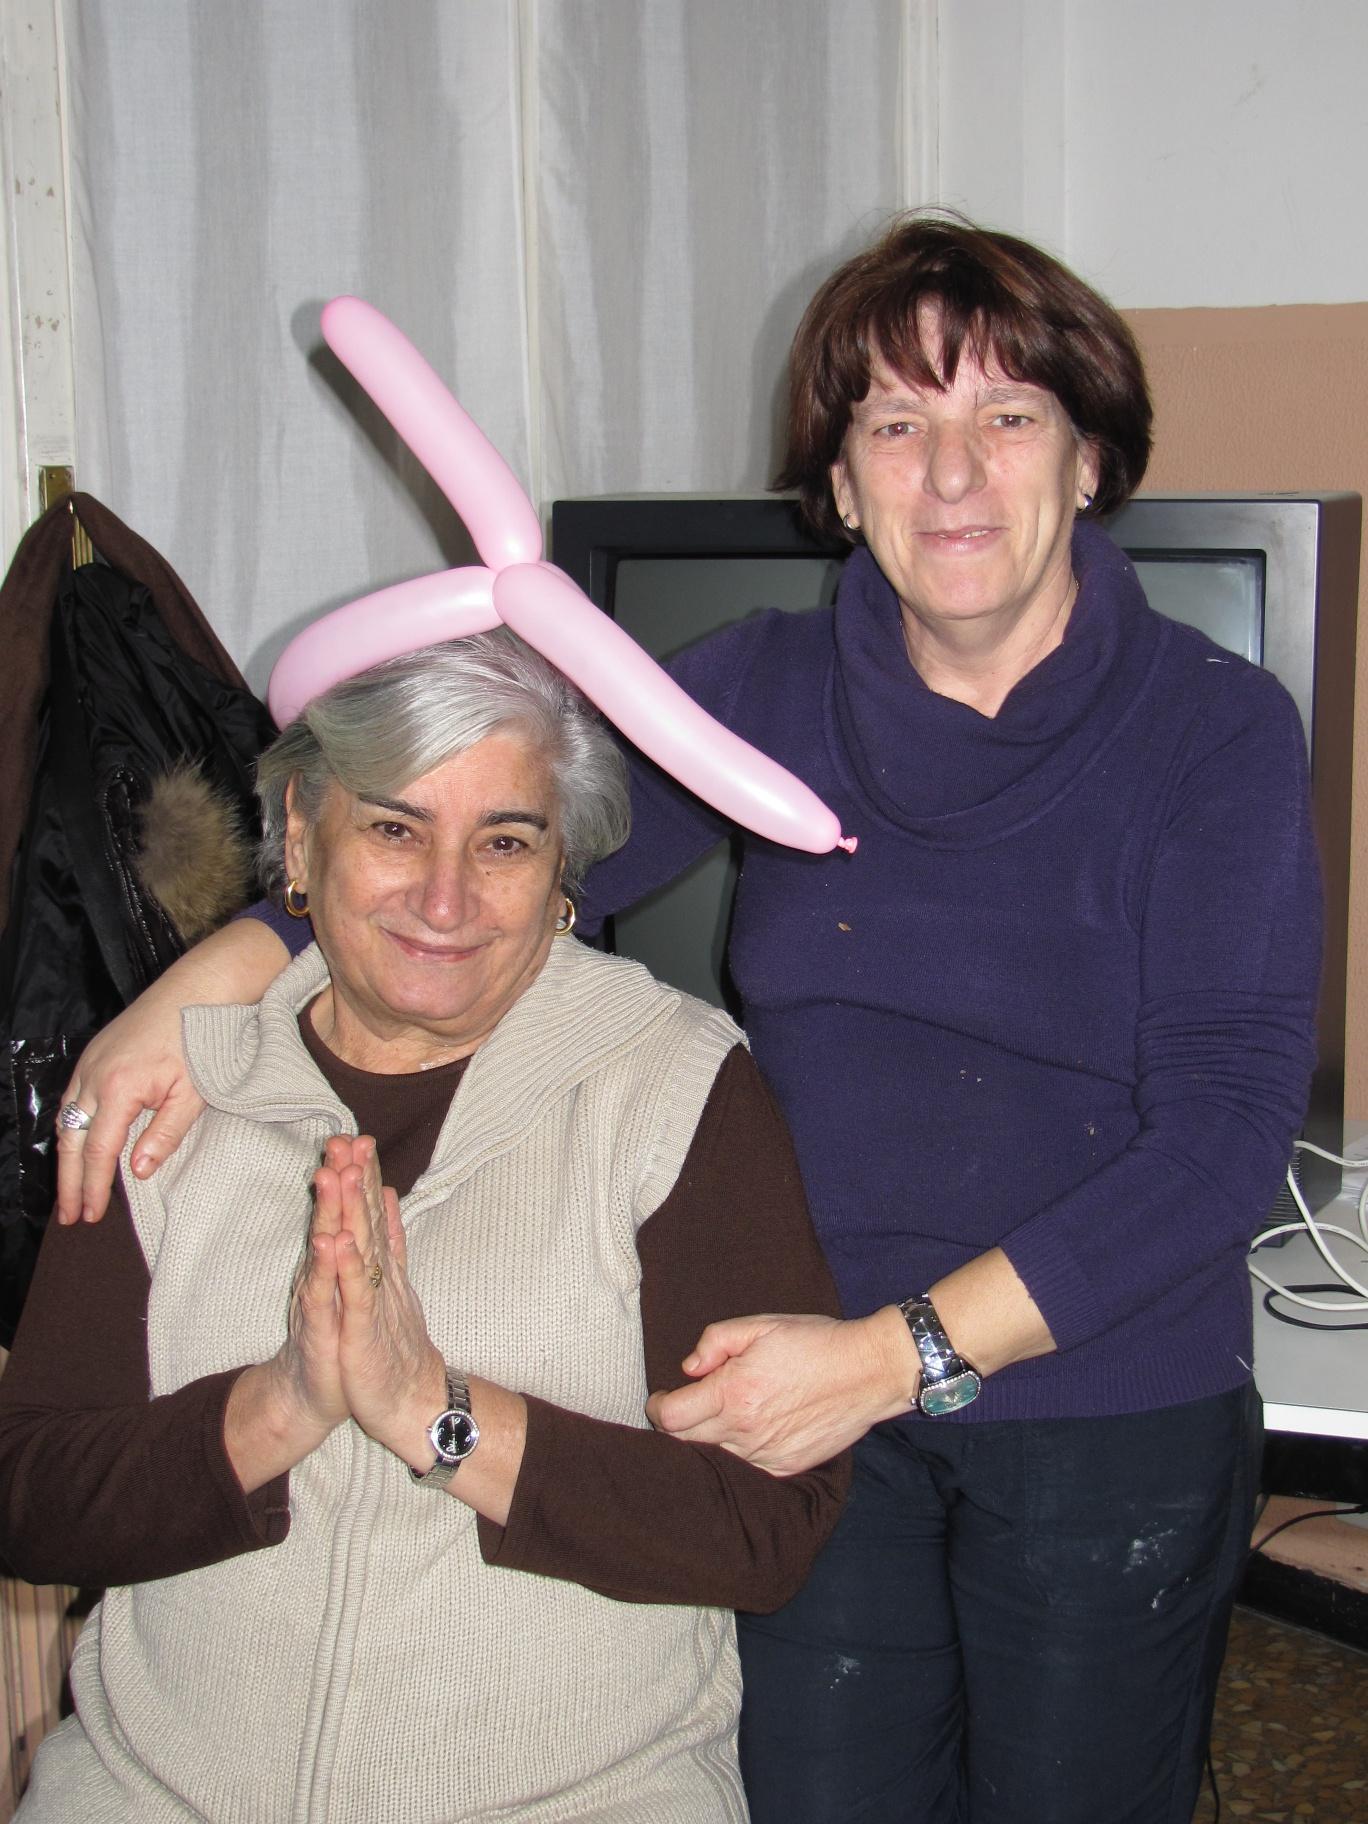 ricordo_battesimo_gesu_2011-01-23-16-58-20